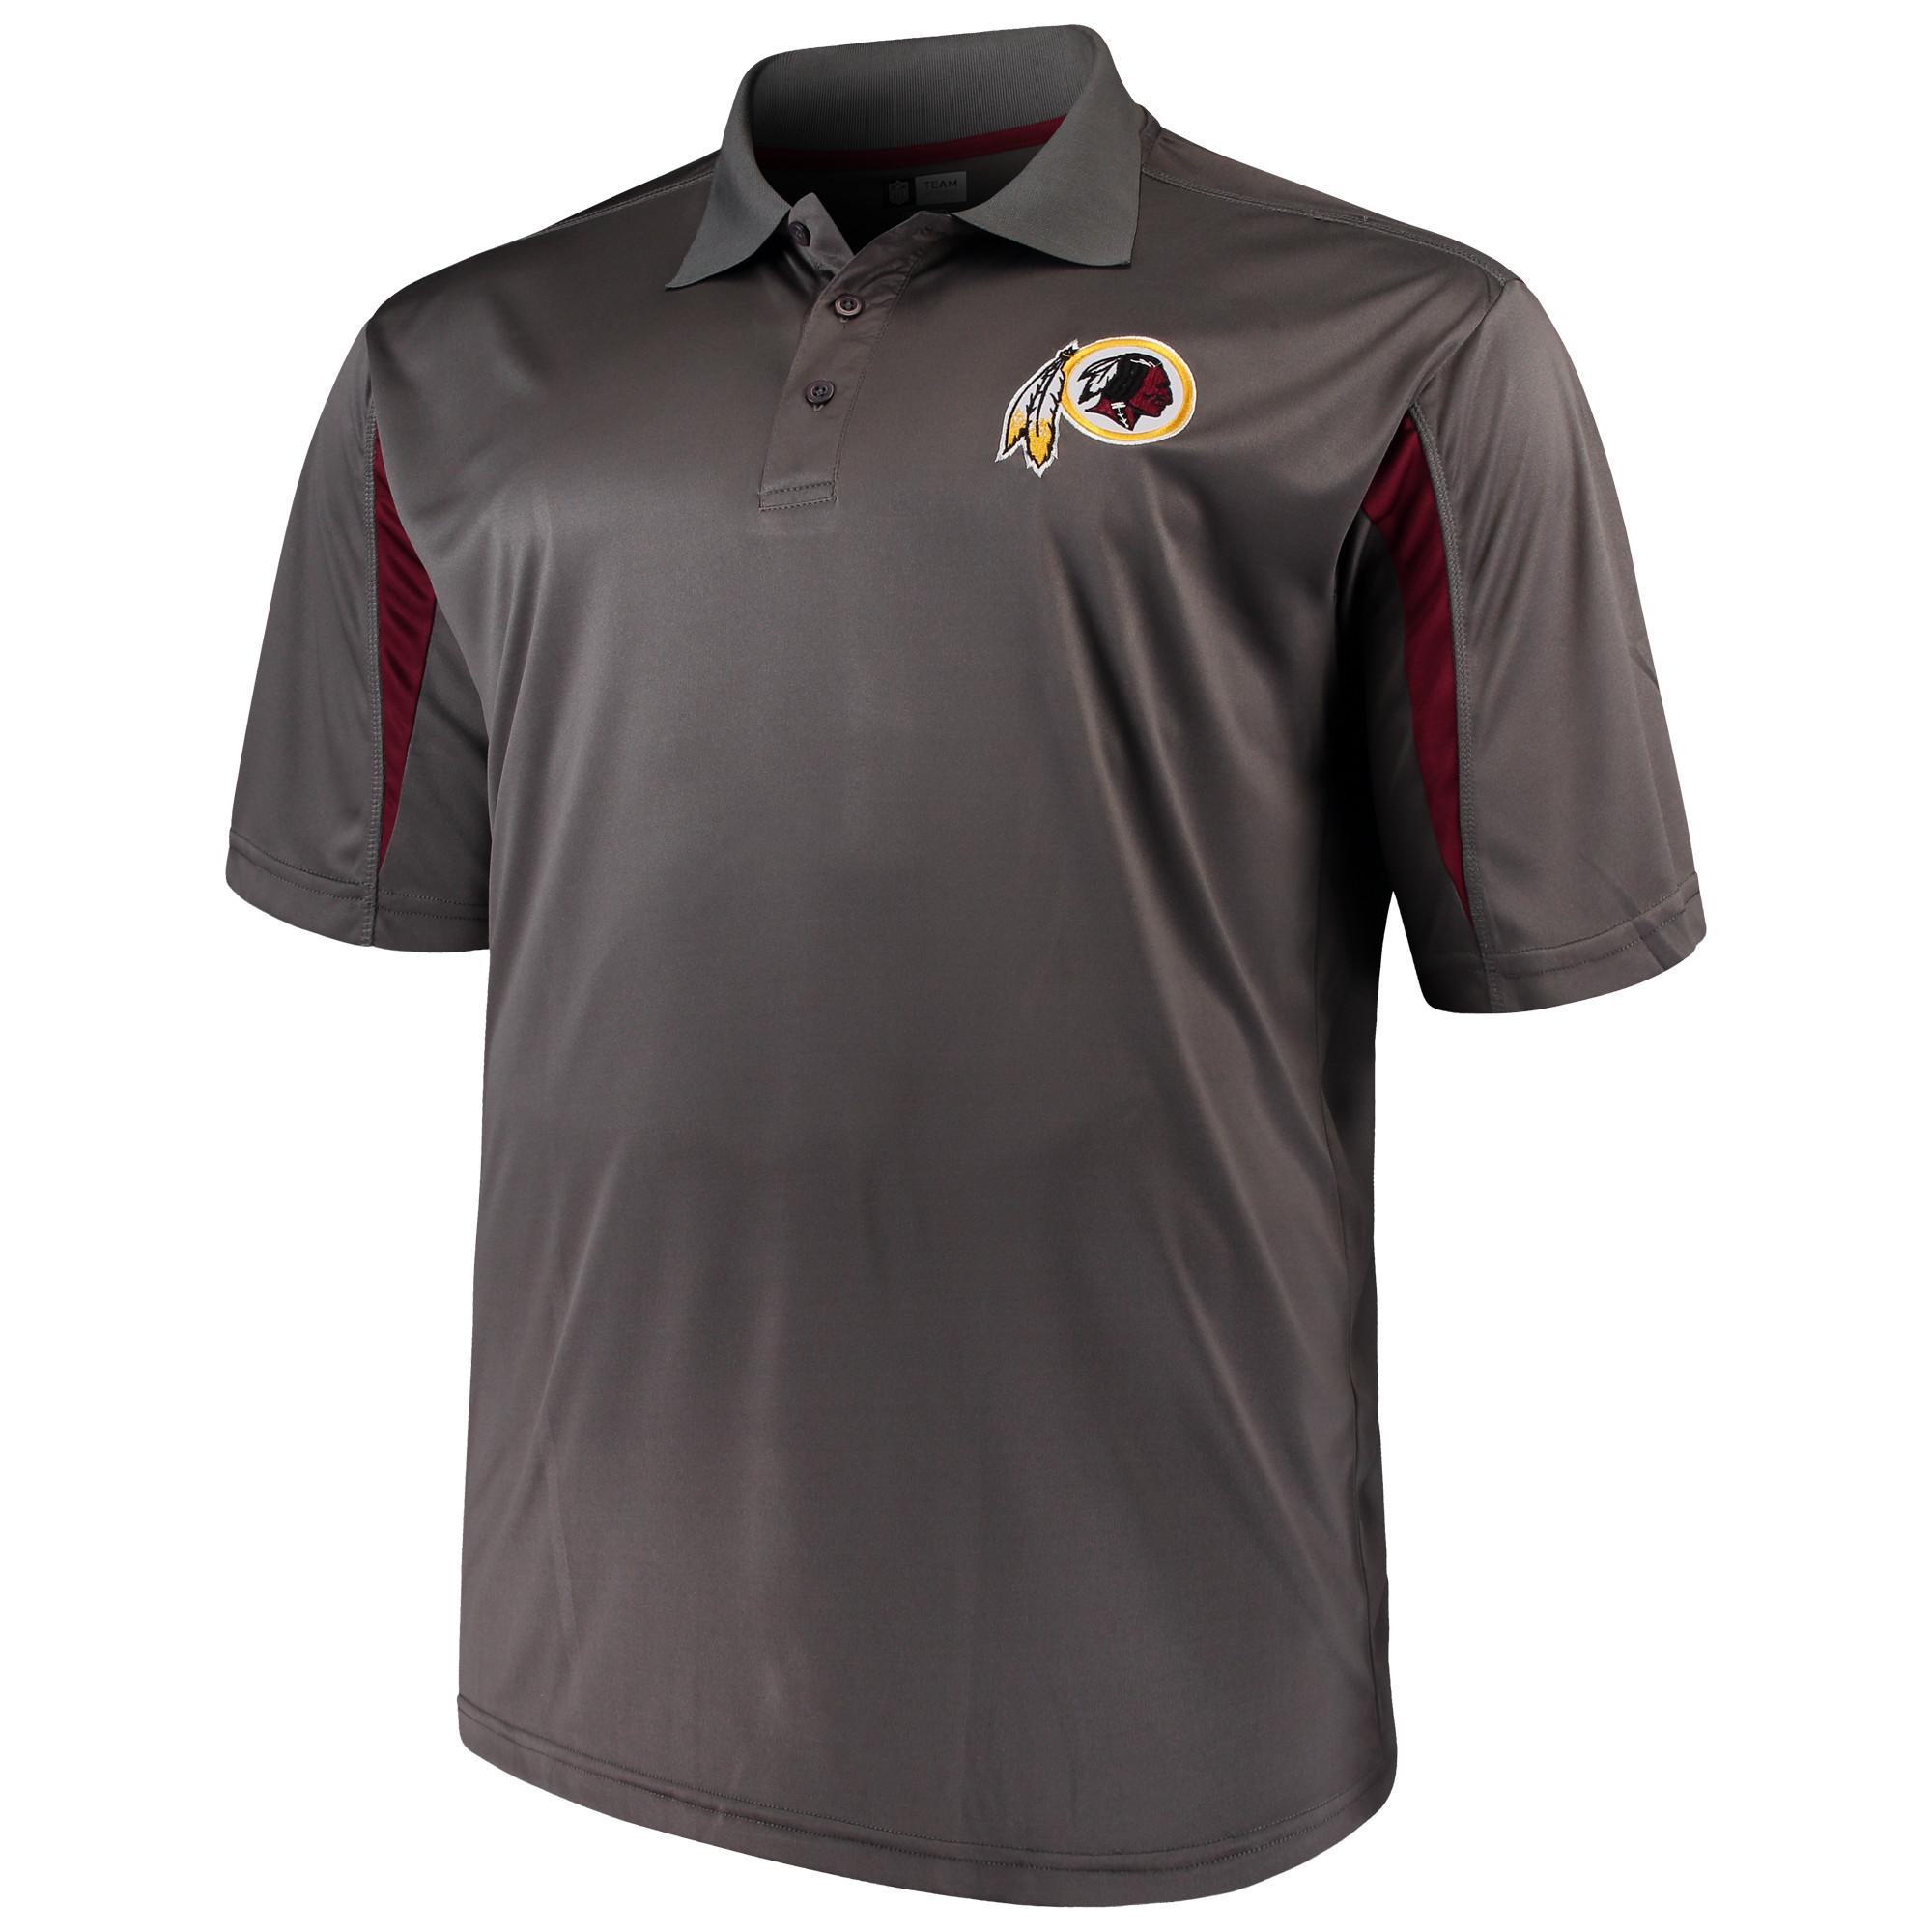 Men's Majestic Charcoal Washington Redskins Big & Tall Pieced Polo